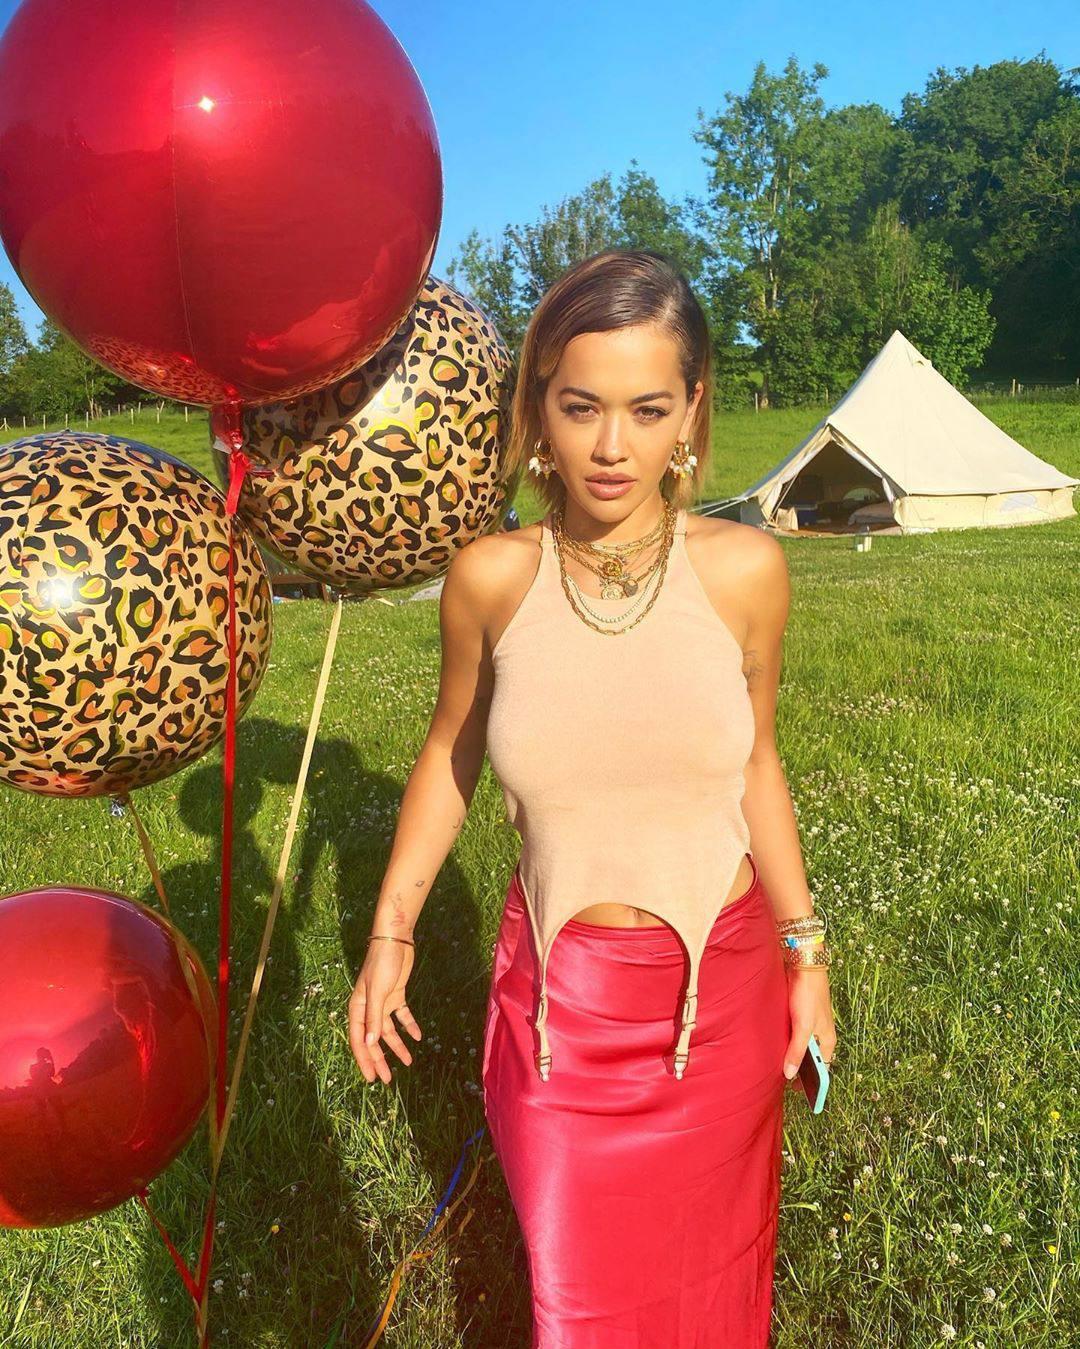 Rita Ora – Sexy Boobs In Braless Photoshoot At Balloon Party 0004